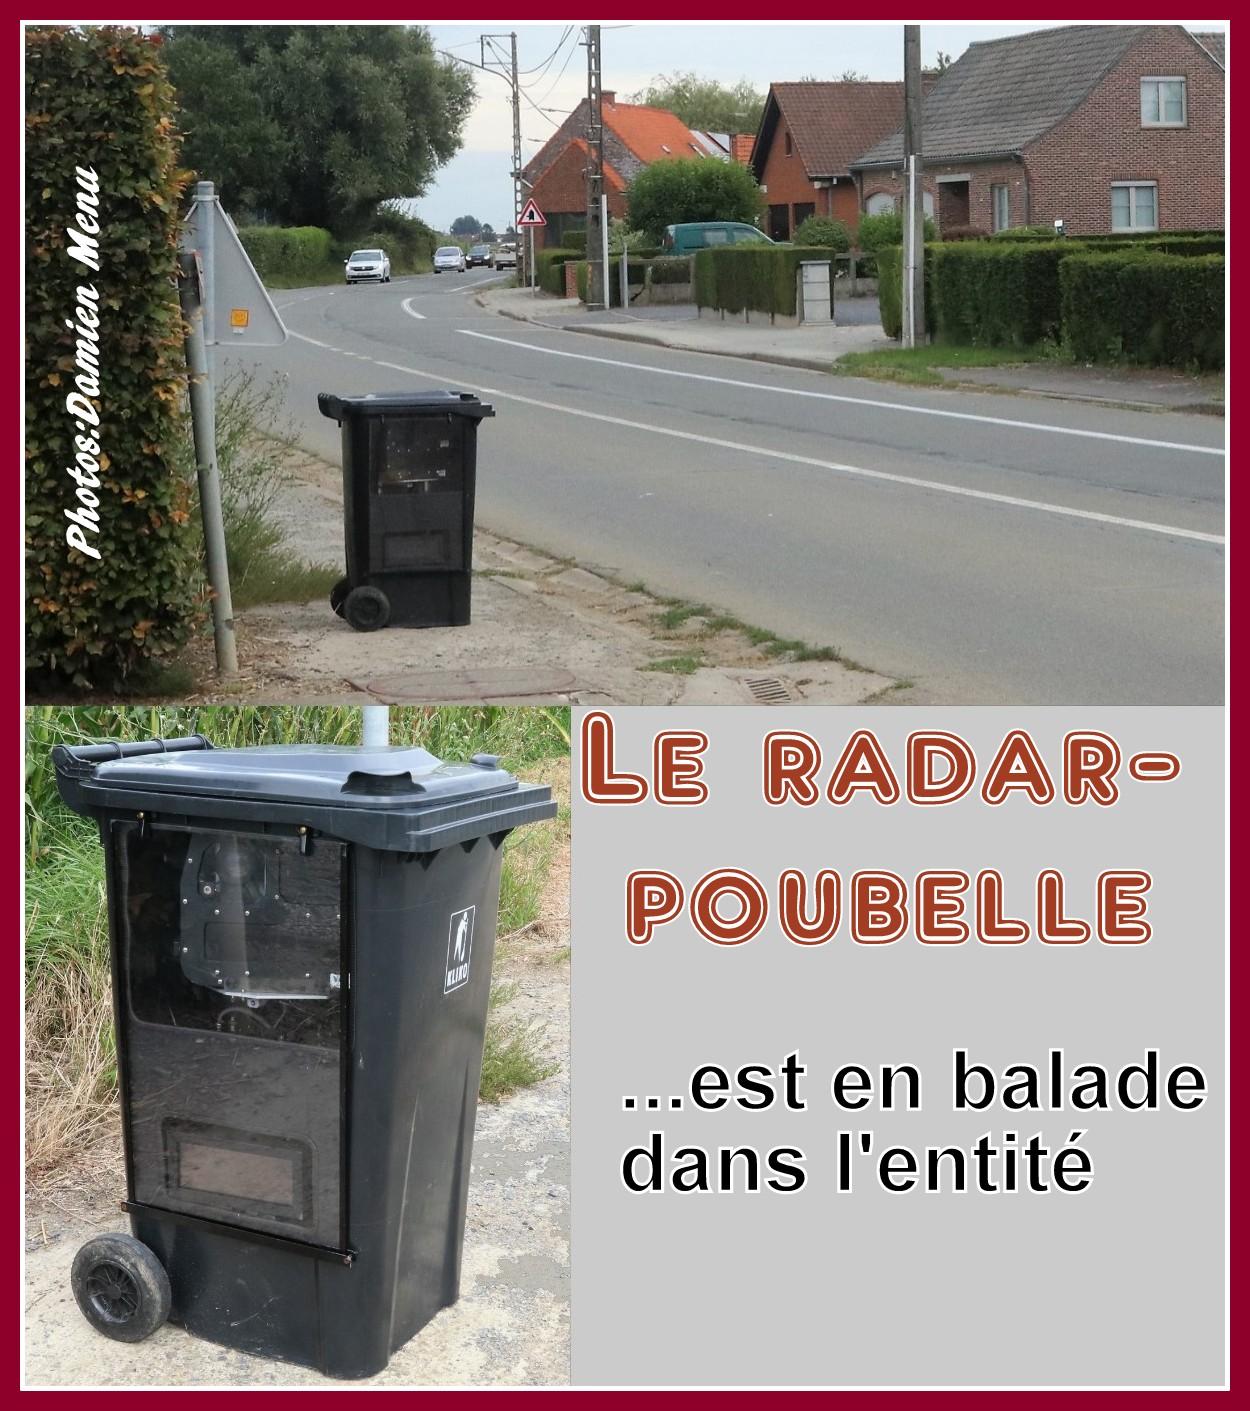 A Comines-Warneton, le radar-poubelle contrôlera la vitesse durant toute la semaine..!